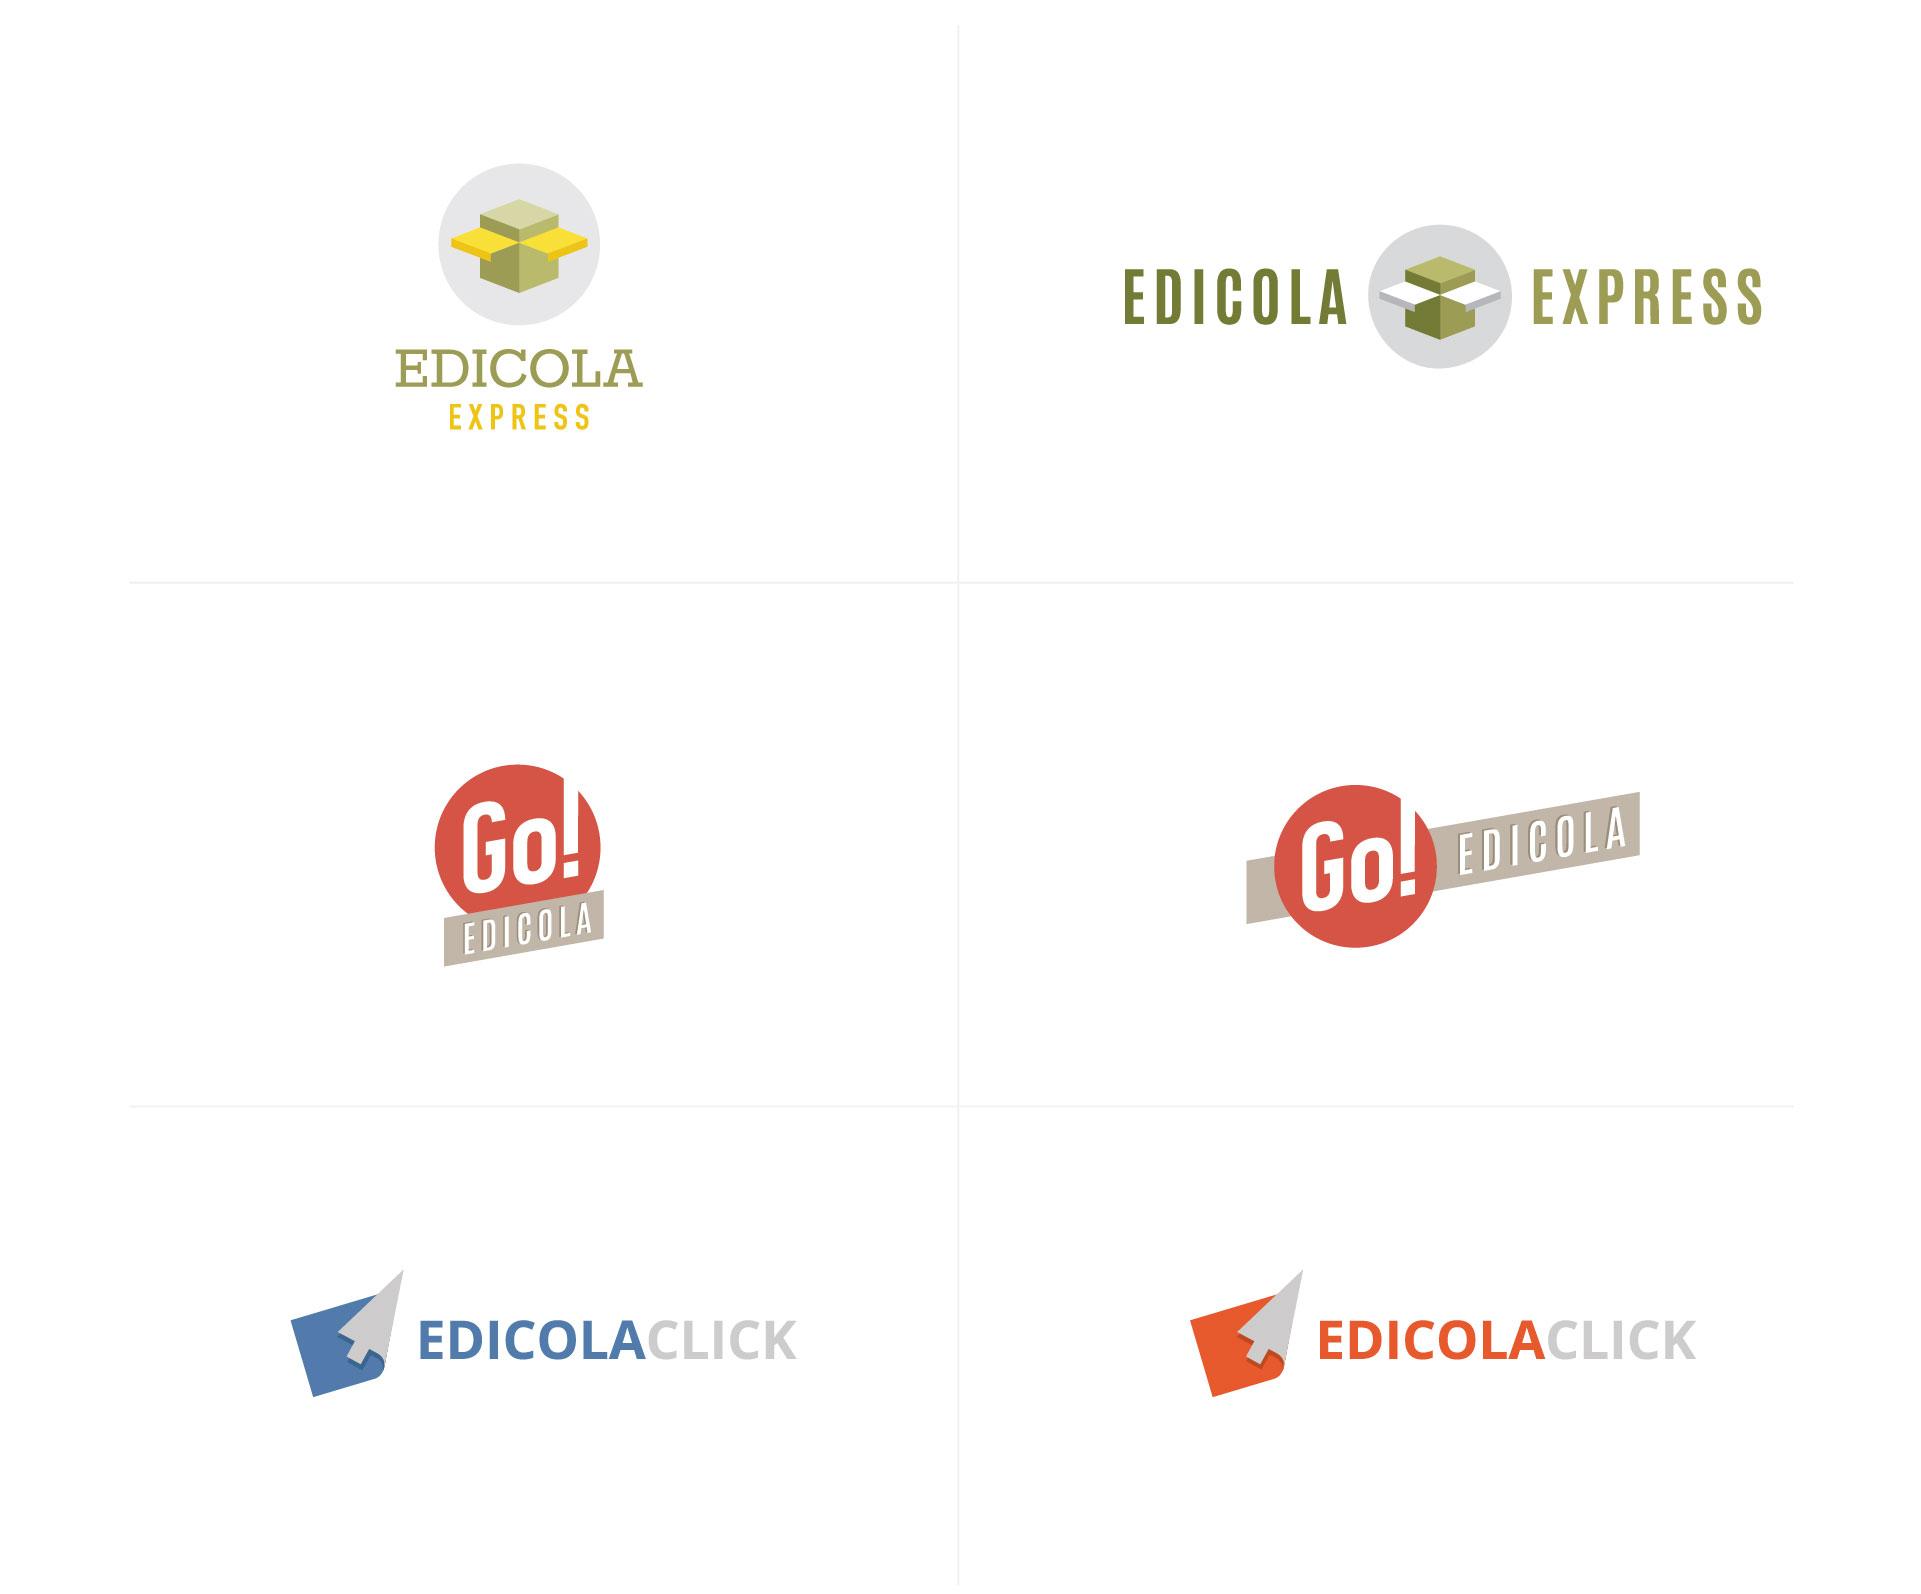 edicola_tn-08